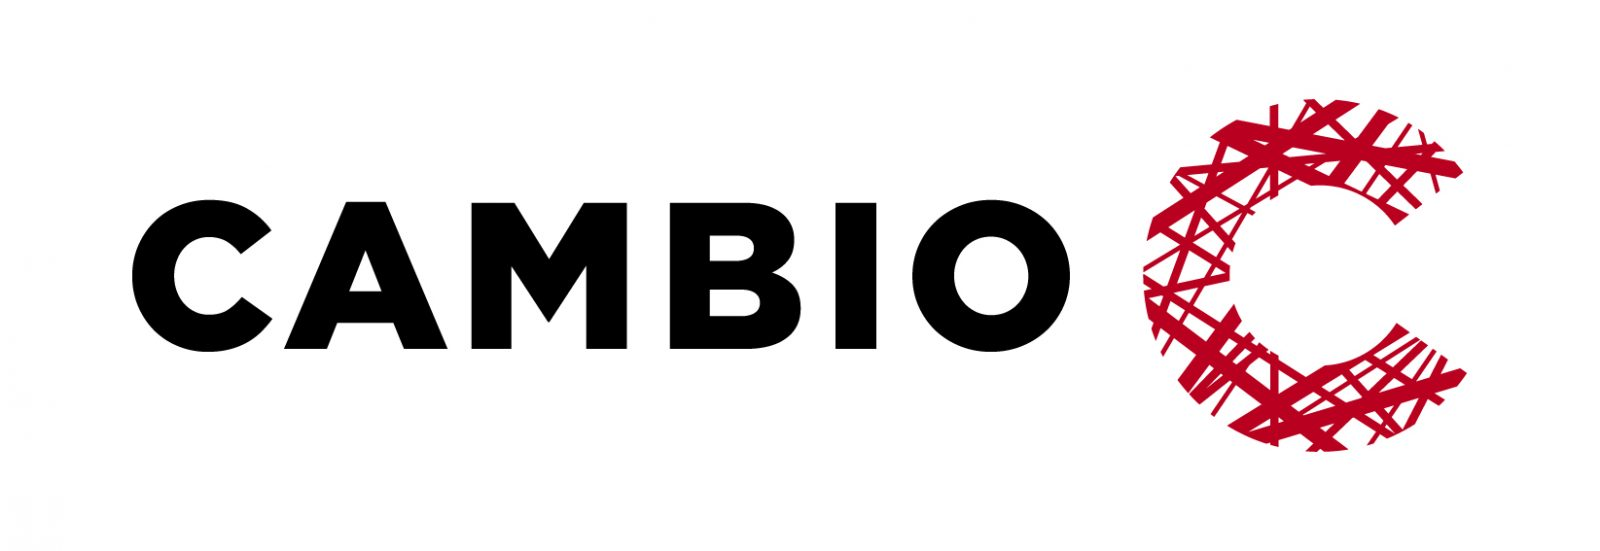 Camibo logga